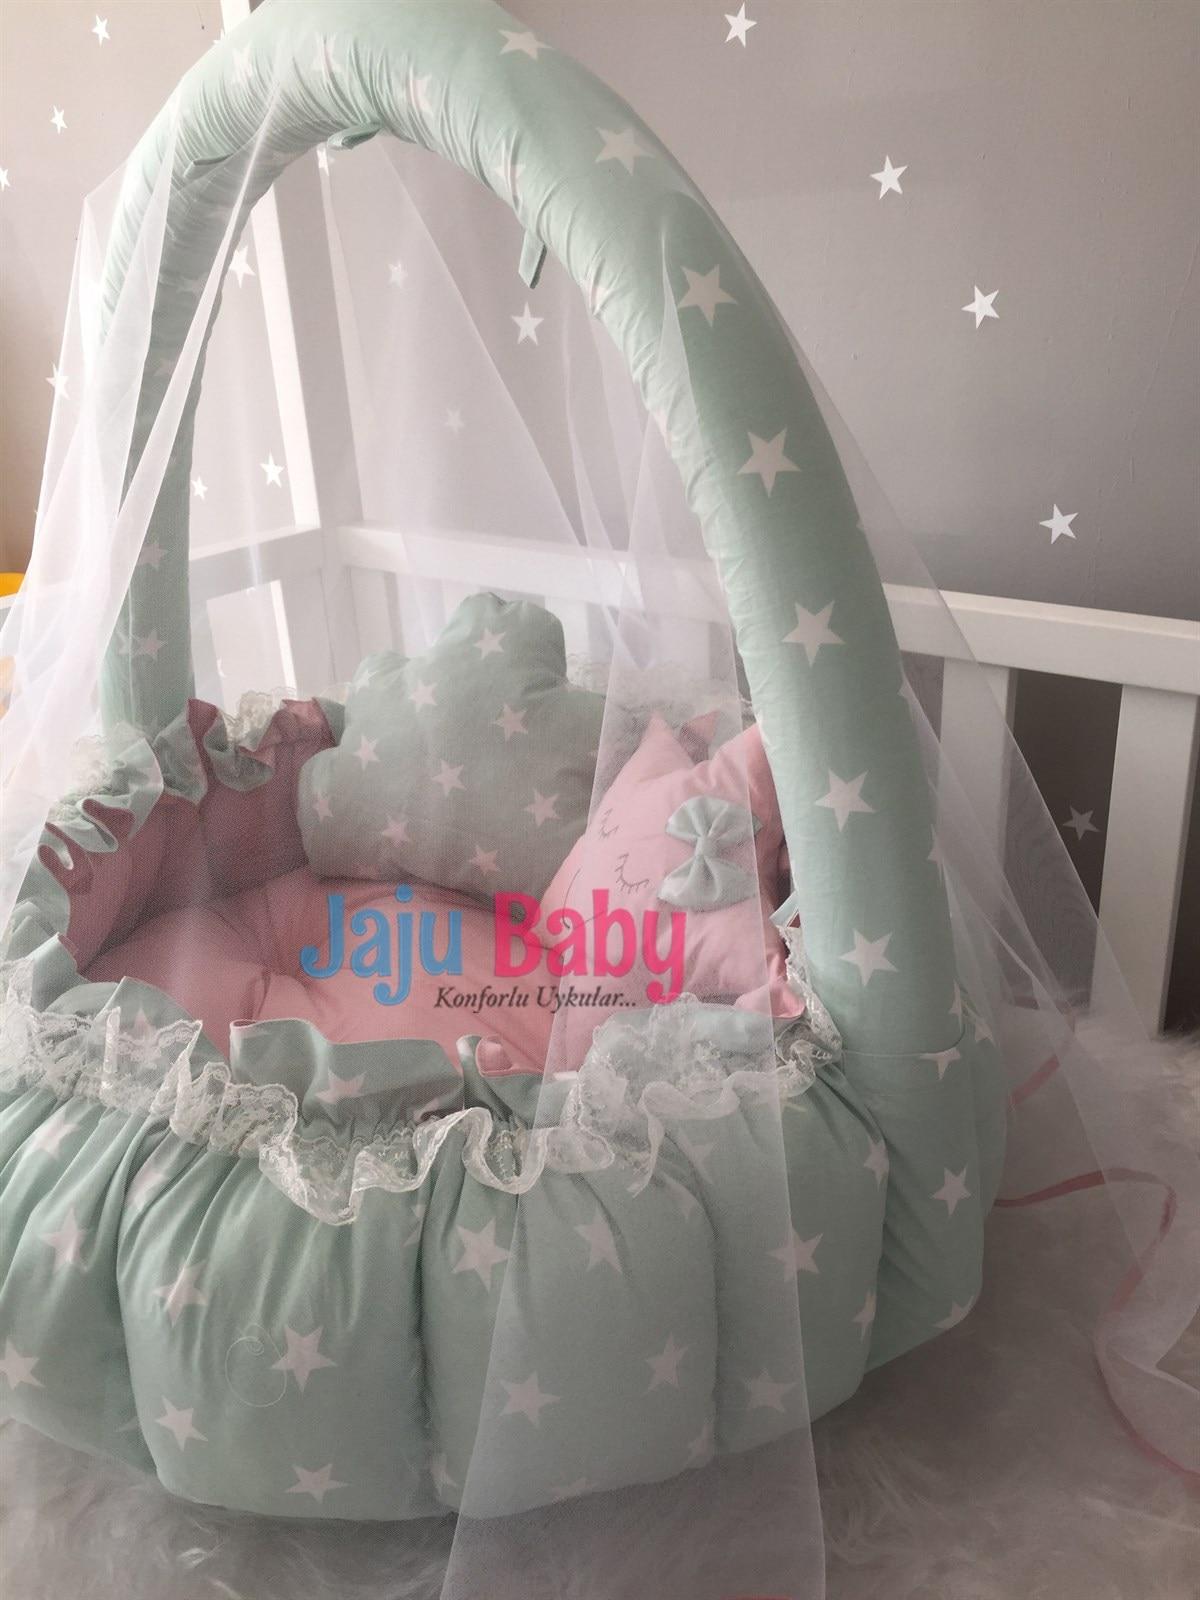 Jaju Baby Handmade Green Star Patterned Design Luxury Play Mat Babynest Mosquito Net Tulle Toy Kit Set enlarge